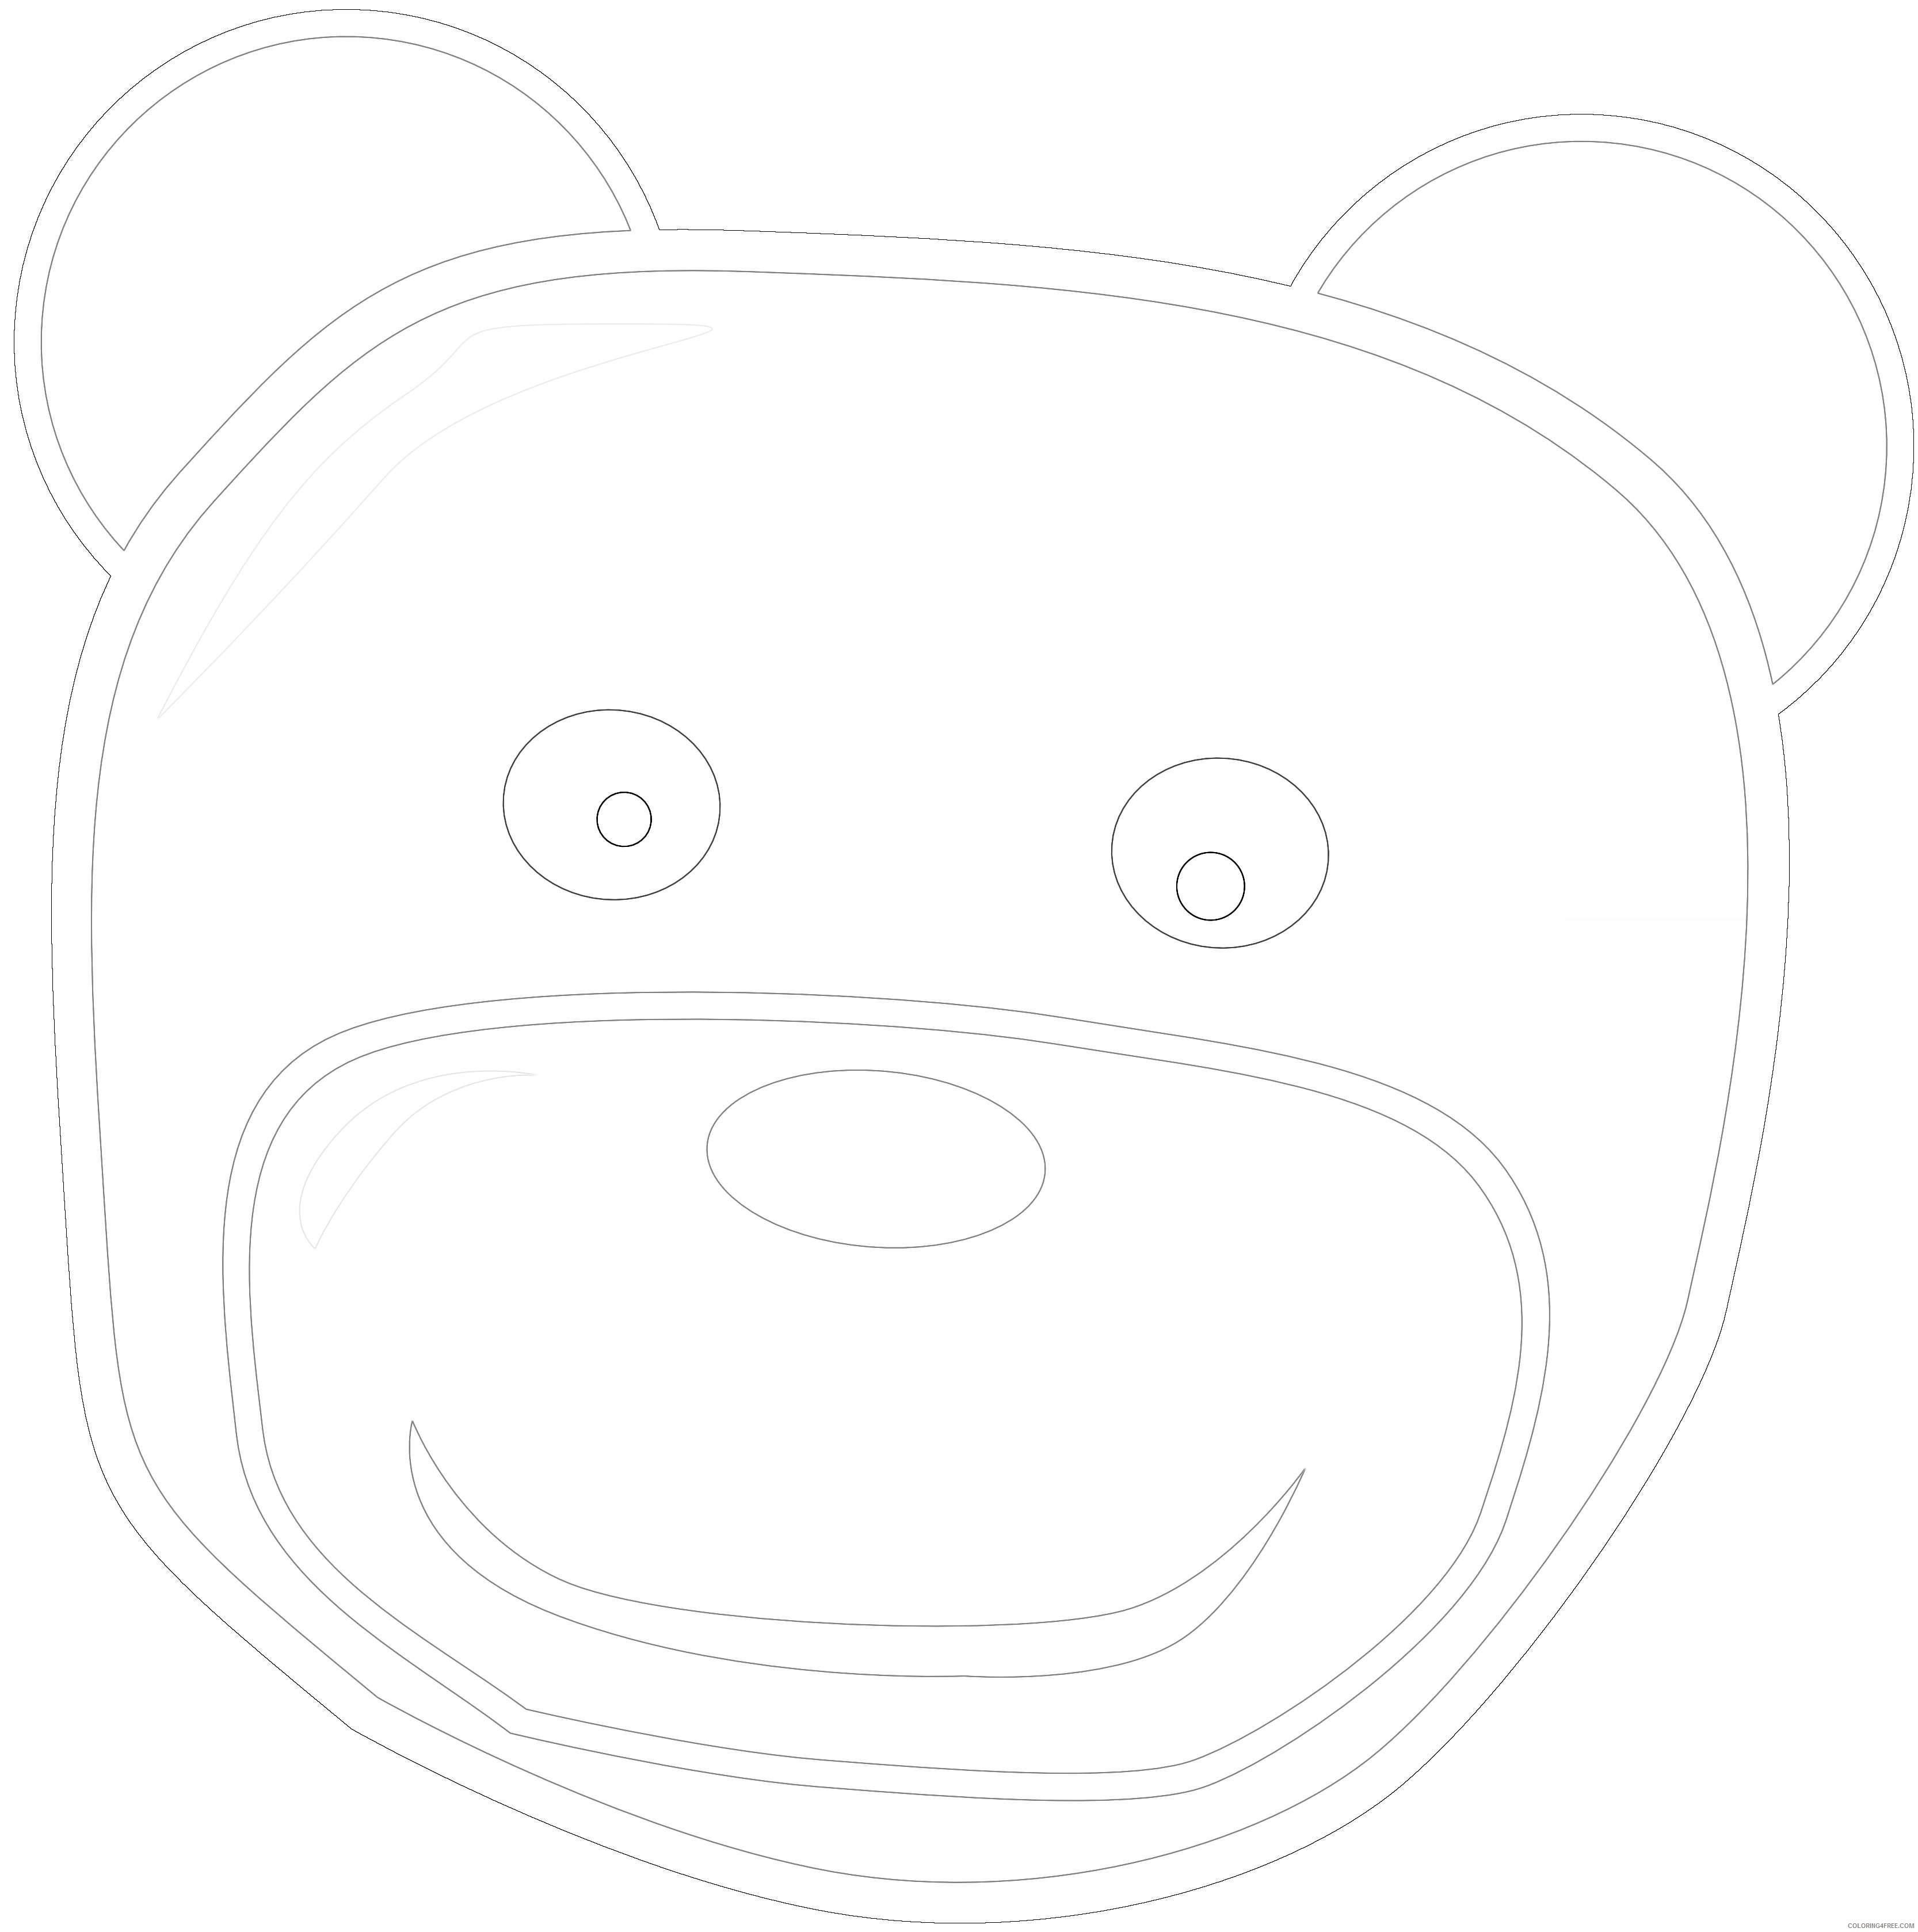 standing bear b1VKbz coloring